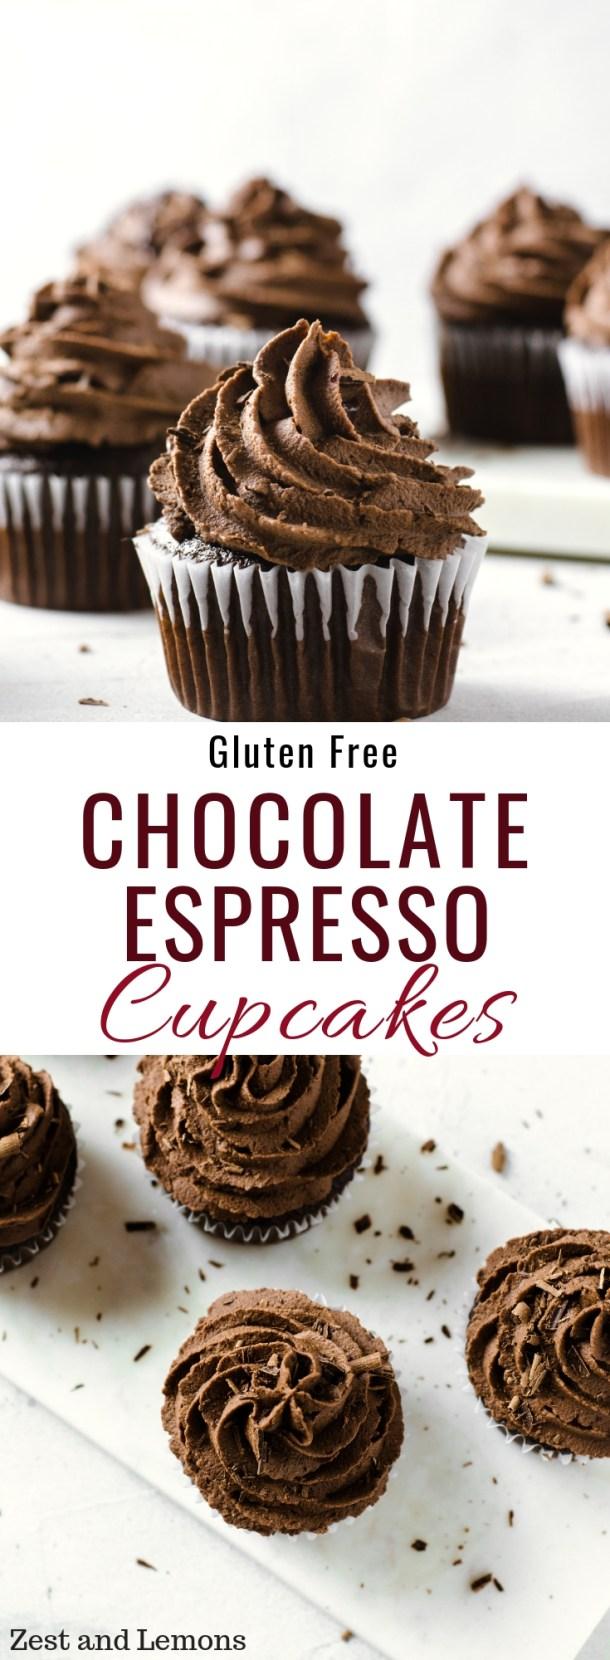 Gluten free chocolate cupcakes with espresso ganache - Zest and Lemons #glutenfreecupcakes #chocolatecupcakes #chocolateespresso